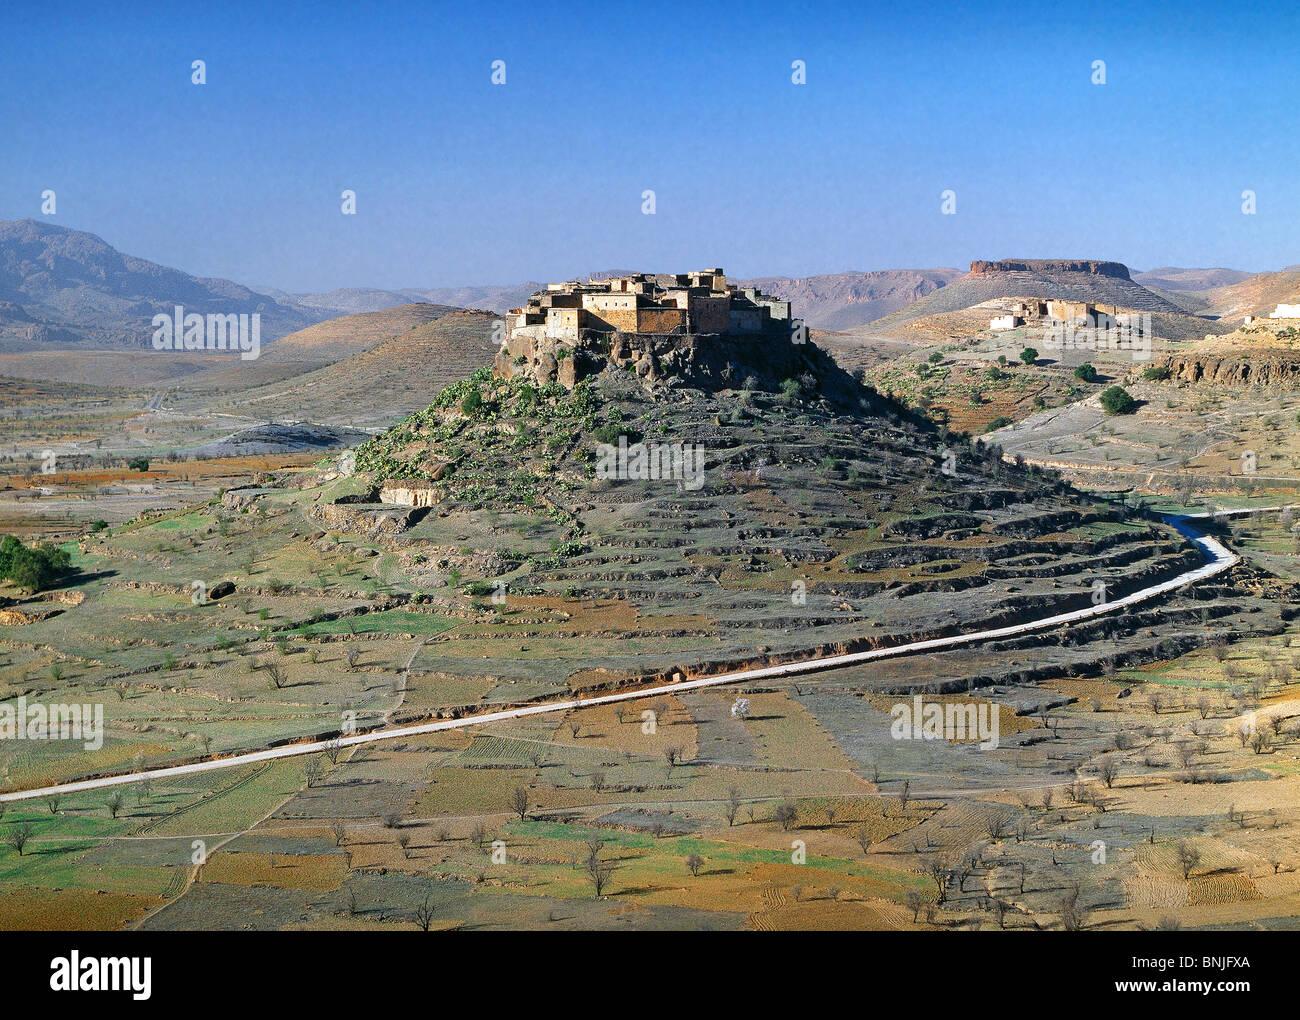 Morocco February 2007 Berber village near Trafoute city hills hill landscape - Stock Image